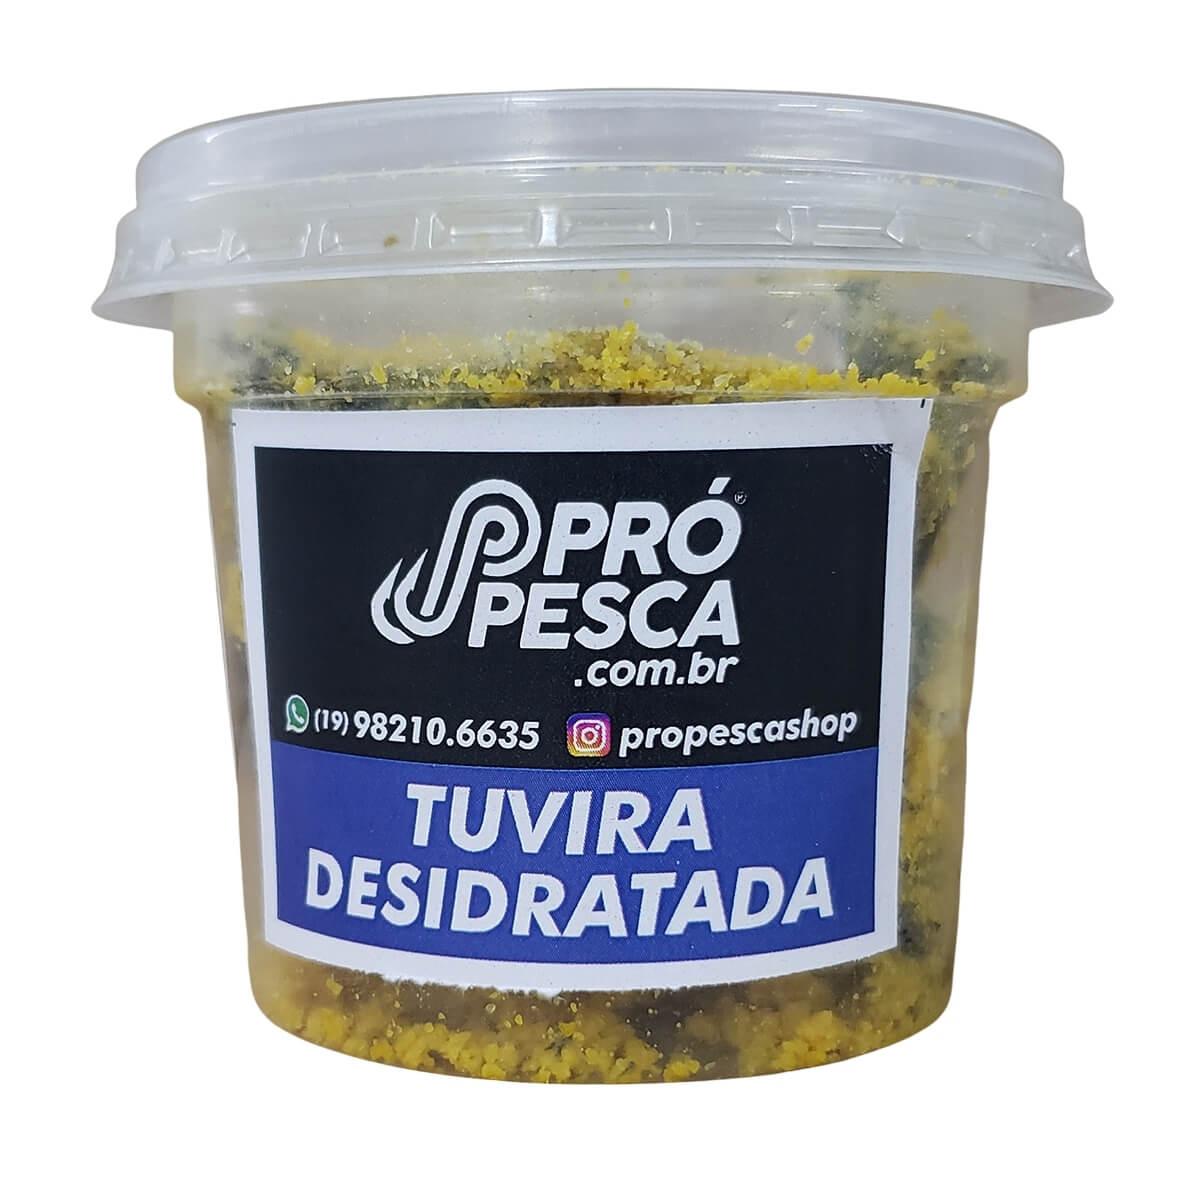 Isca para Pesca Tuvira Desidratada Pró Pesca  - Pró Pesca Shop